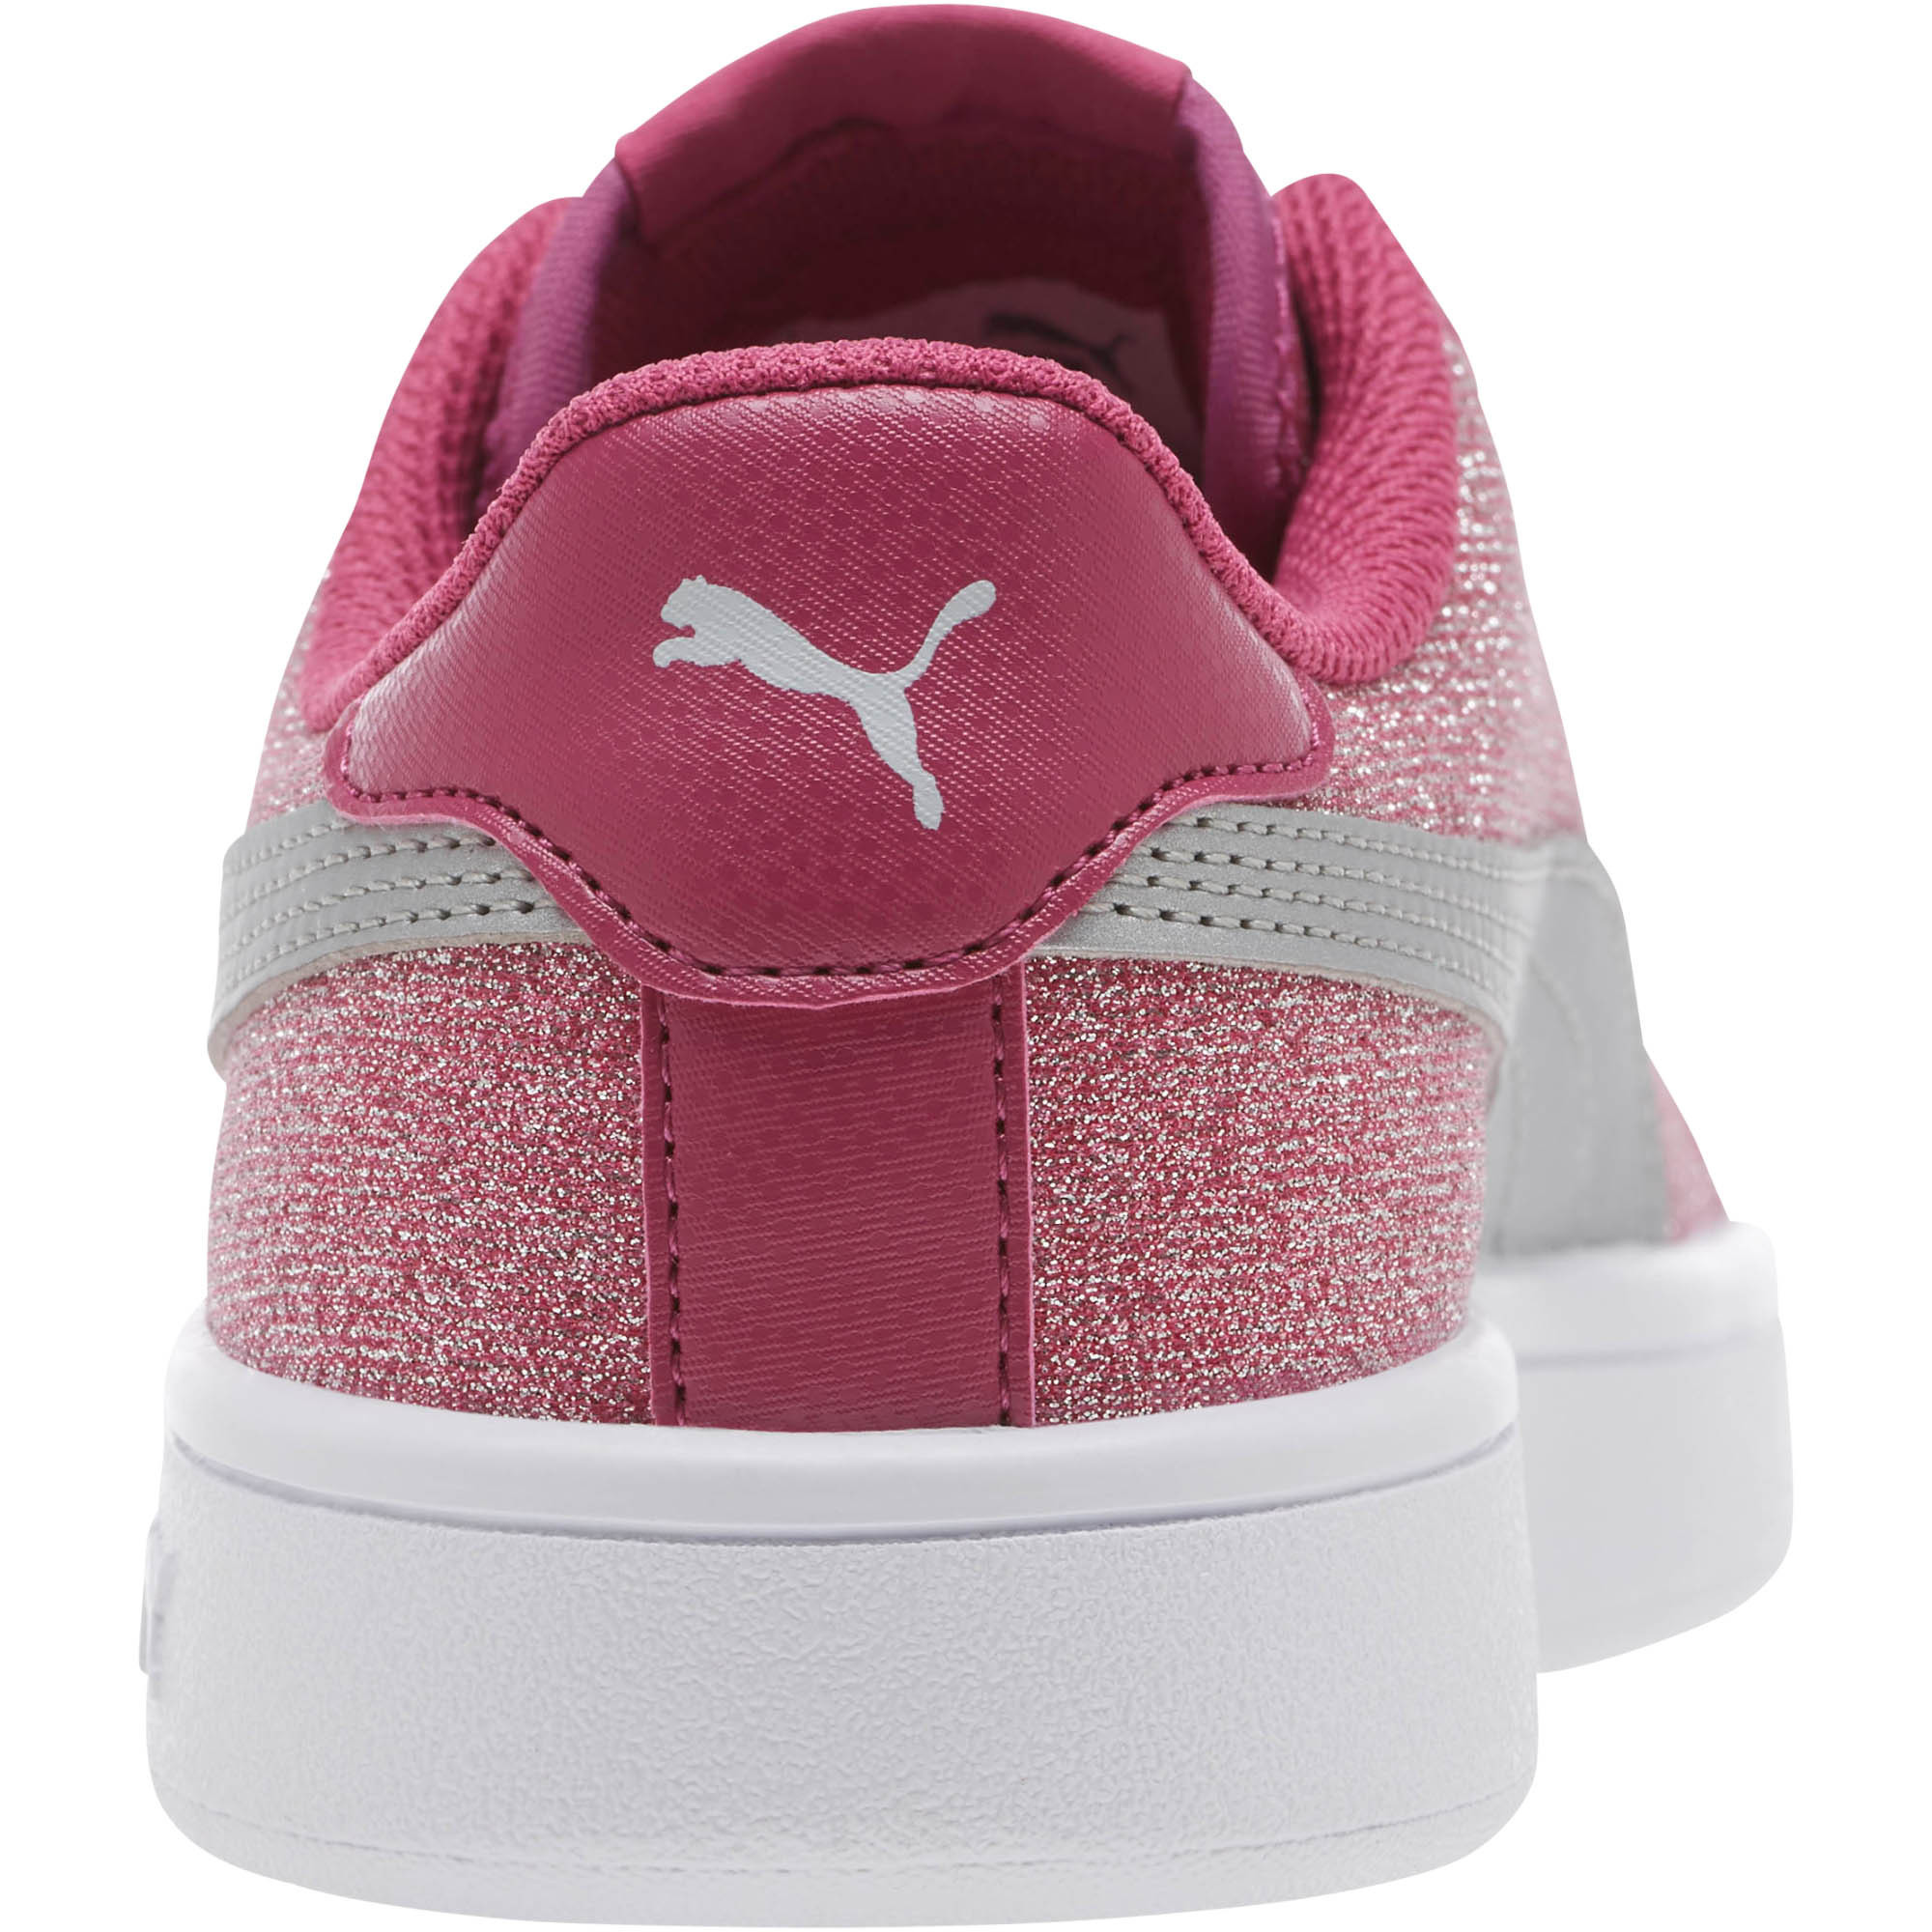 PUMA-Smash-v2-Glitz-Glam-Sneakers-JR-Girls-Shoe-Kids thumbnail 8